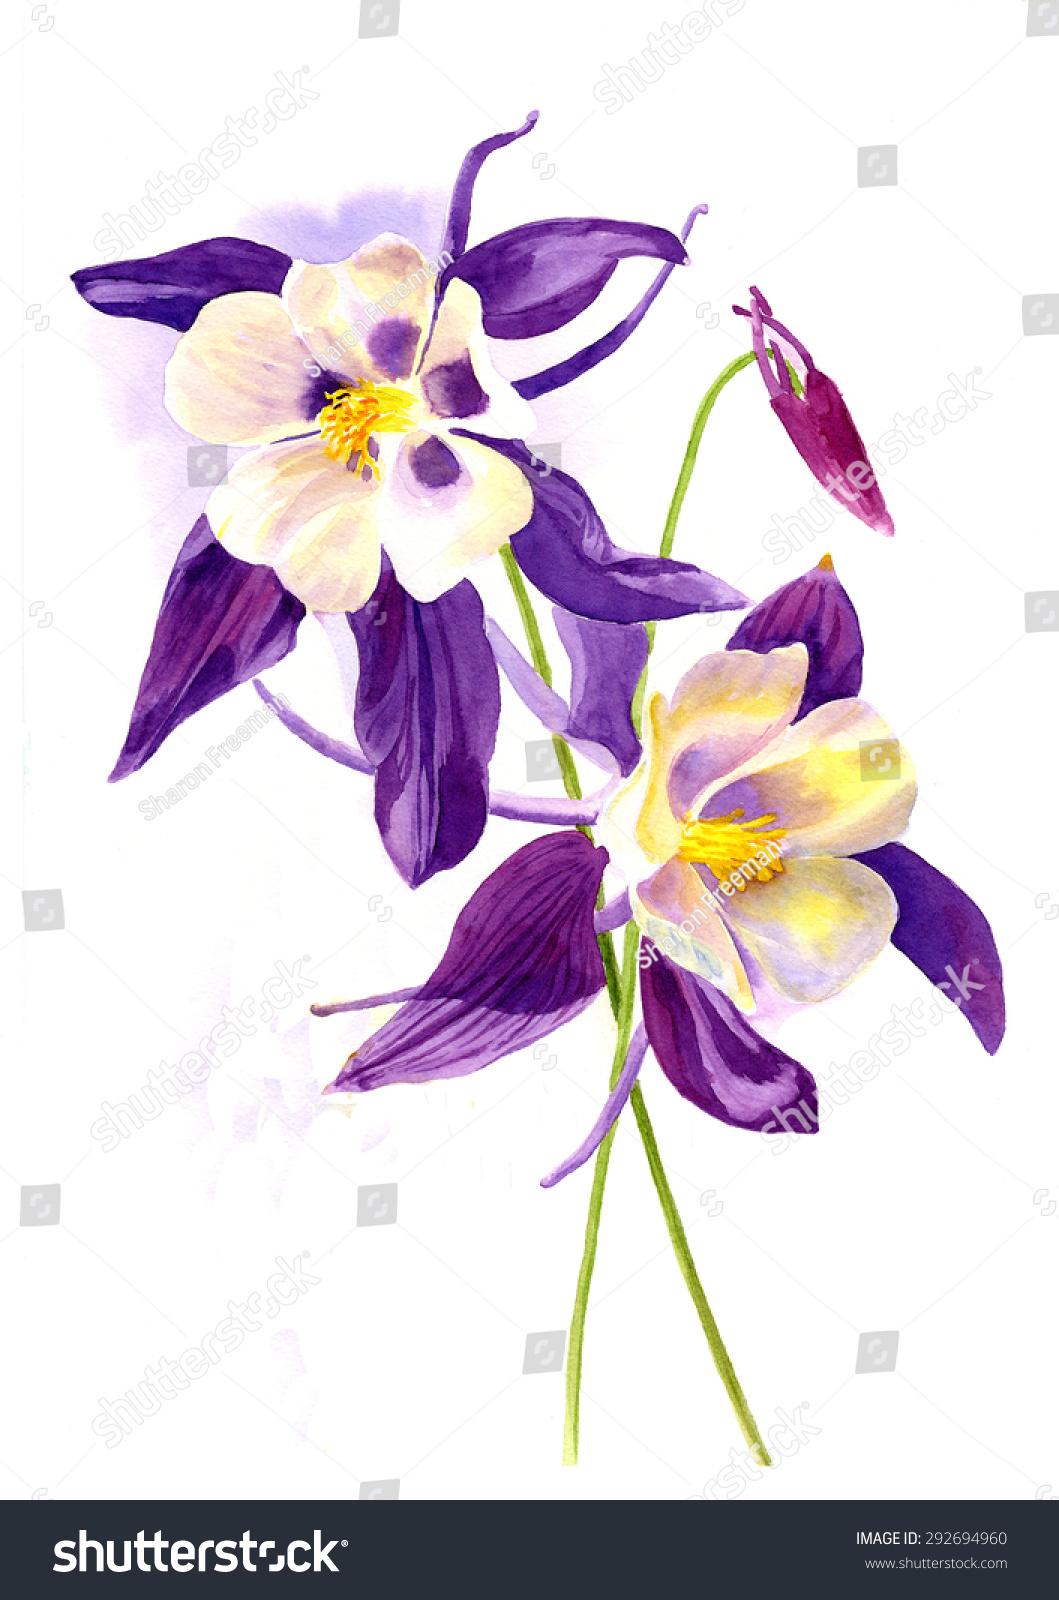 Two Purple Columbine Flowers Watercolor Painting Stock Illustration